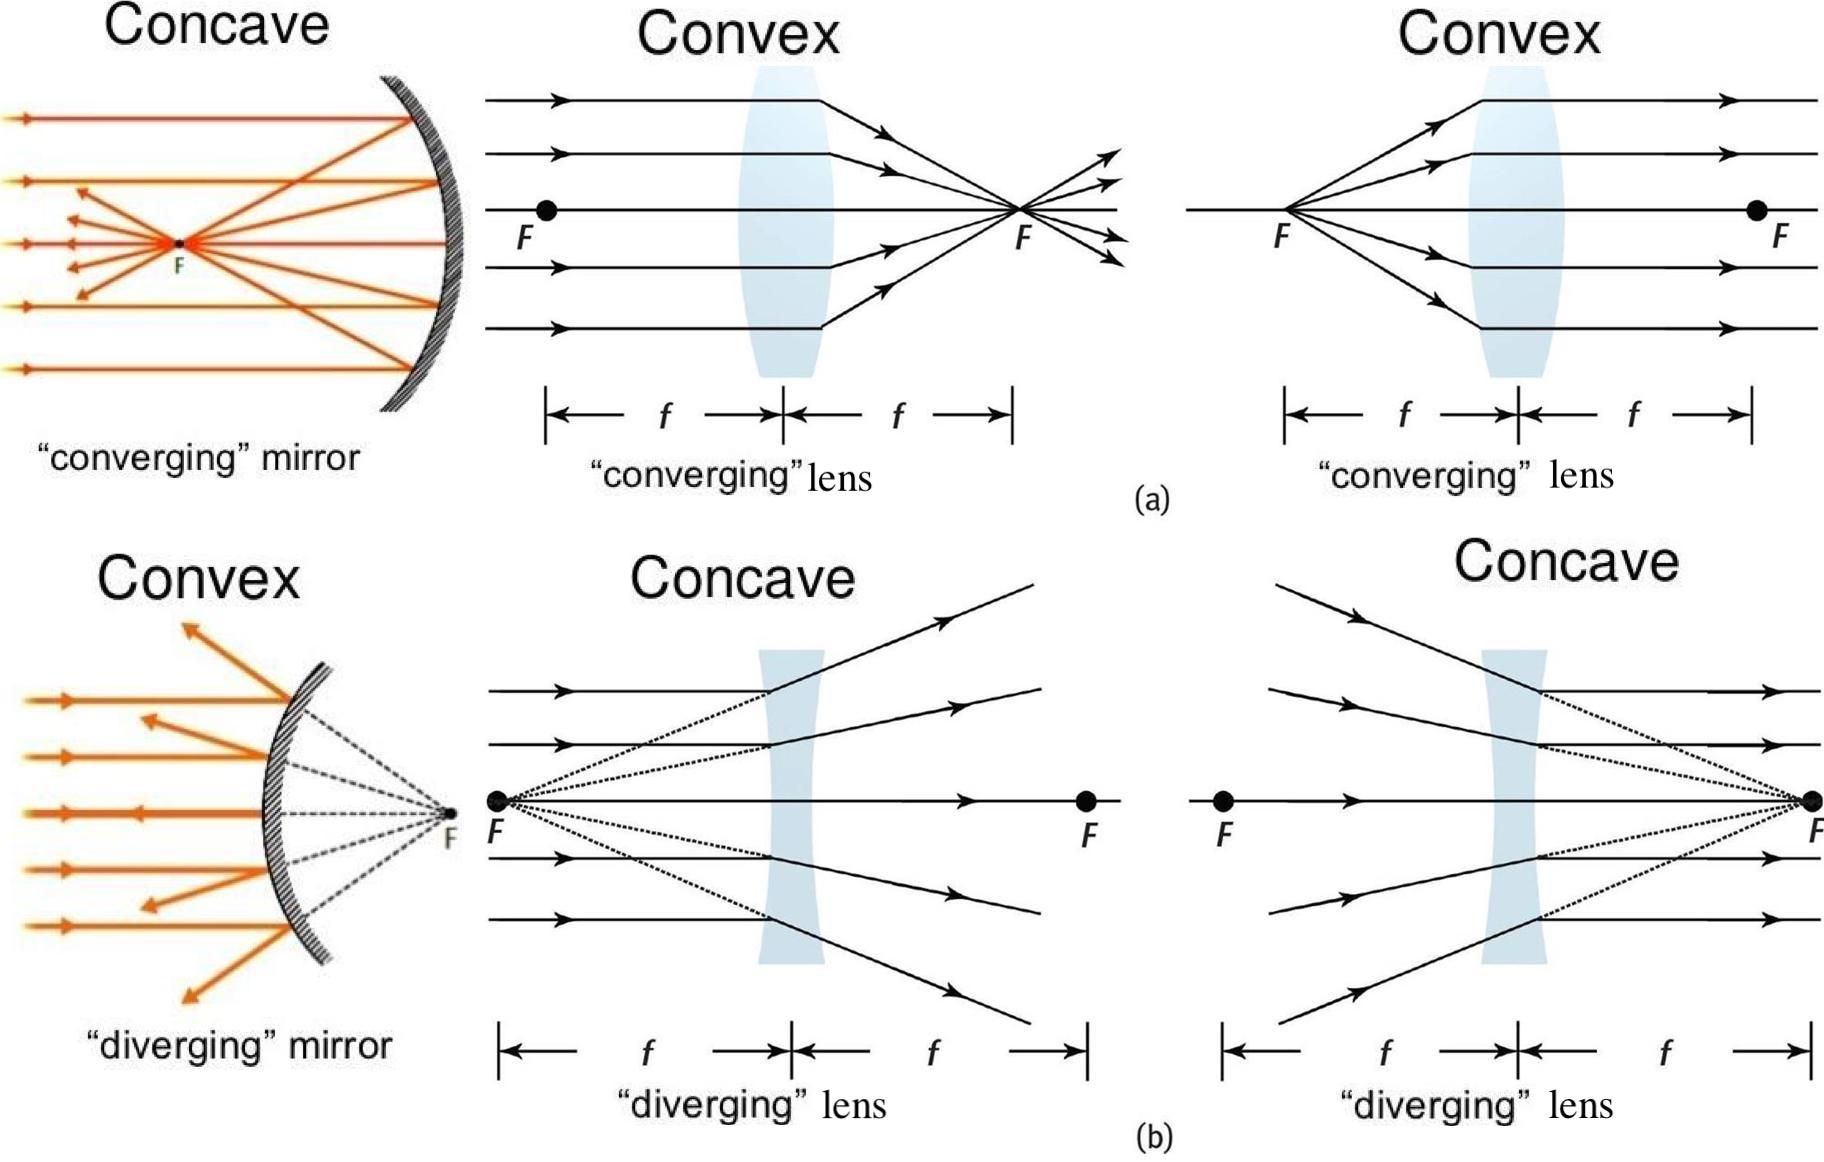 Imp Concave Vs Convex And Reflective Mirror Vs Refractive Lens In 2020 Concave Mirrors Convex Mirror Image Form